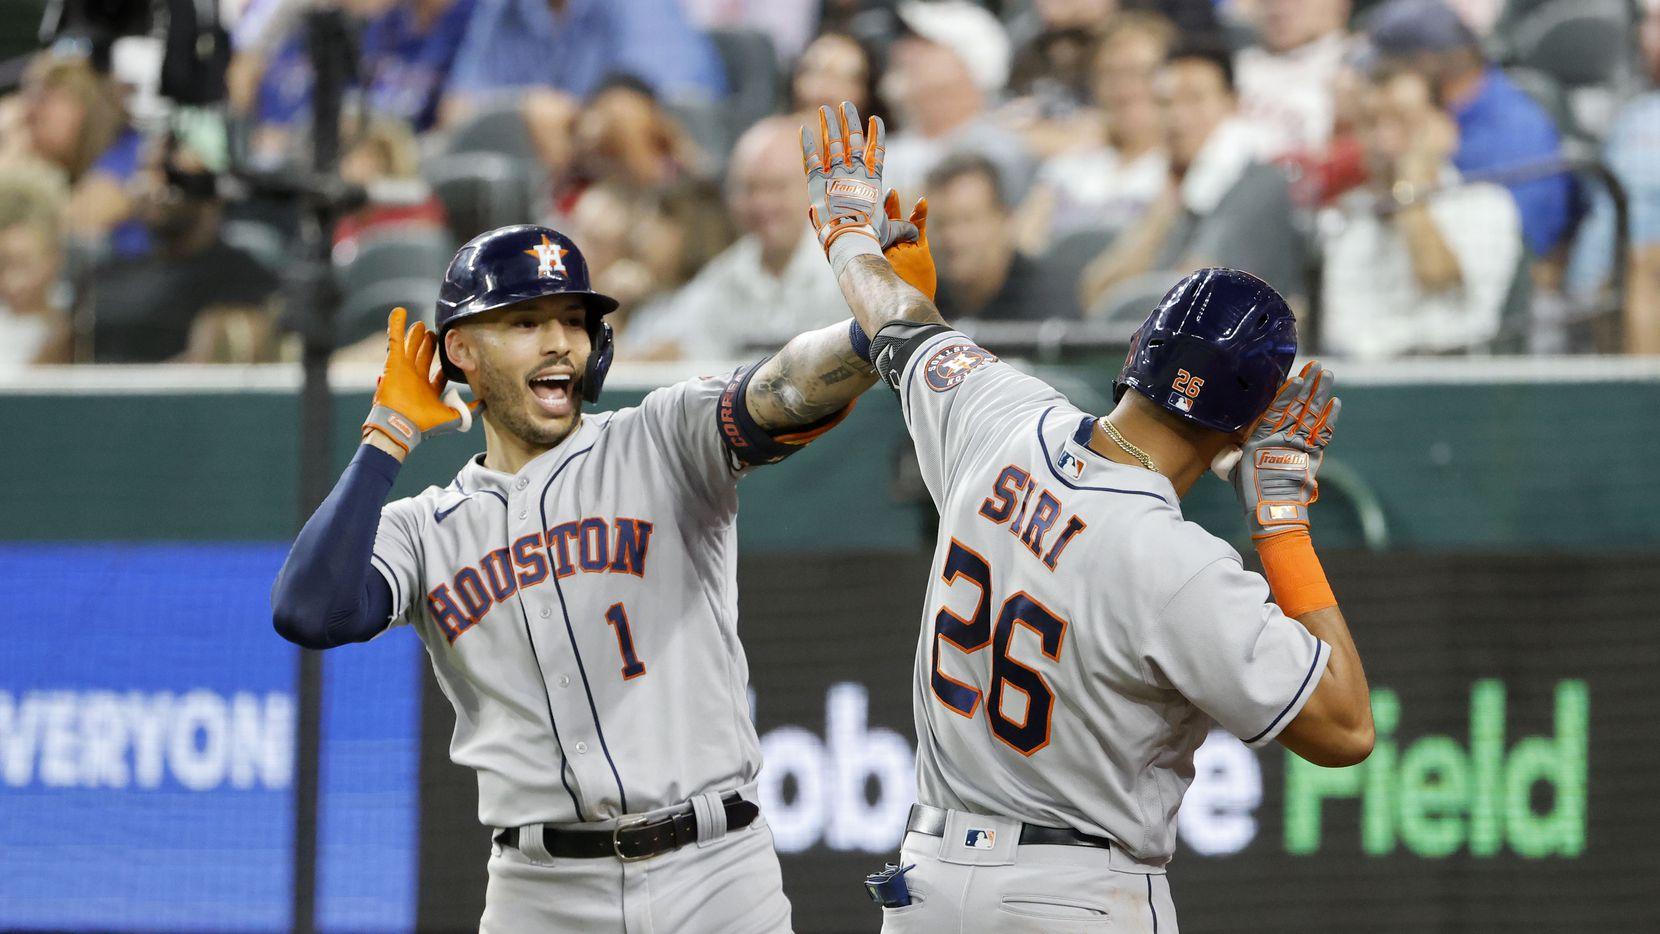 Houston Astros' Carlos Correa (1) celebrates his three-run home run against the Texas Rangers with Jose Siri (26) during the fourth inning of an MLB baseball game in Arlington, Texas on Thursday, Sept. 16, 2021.